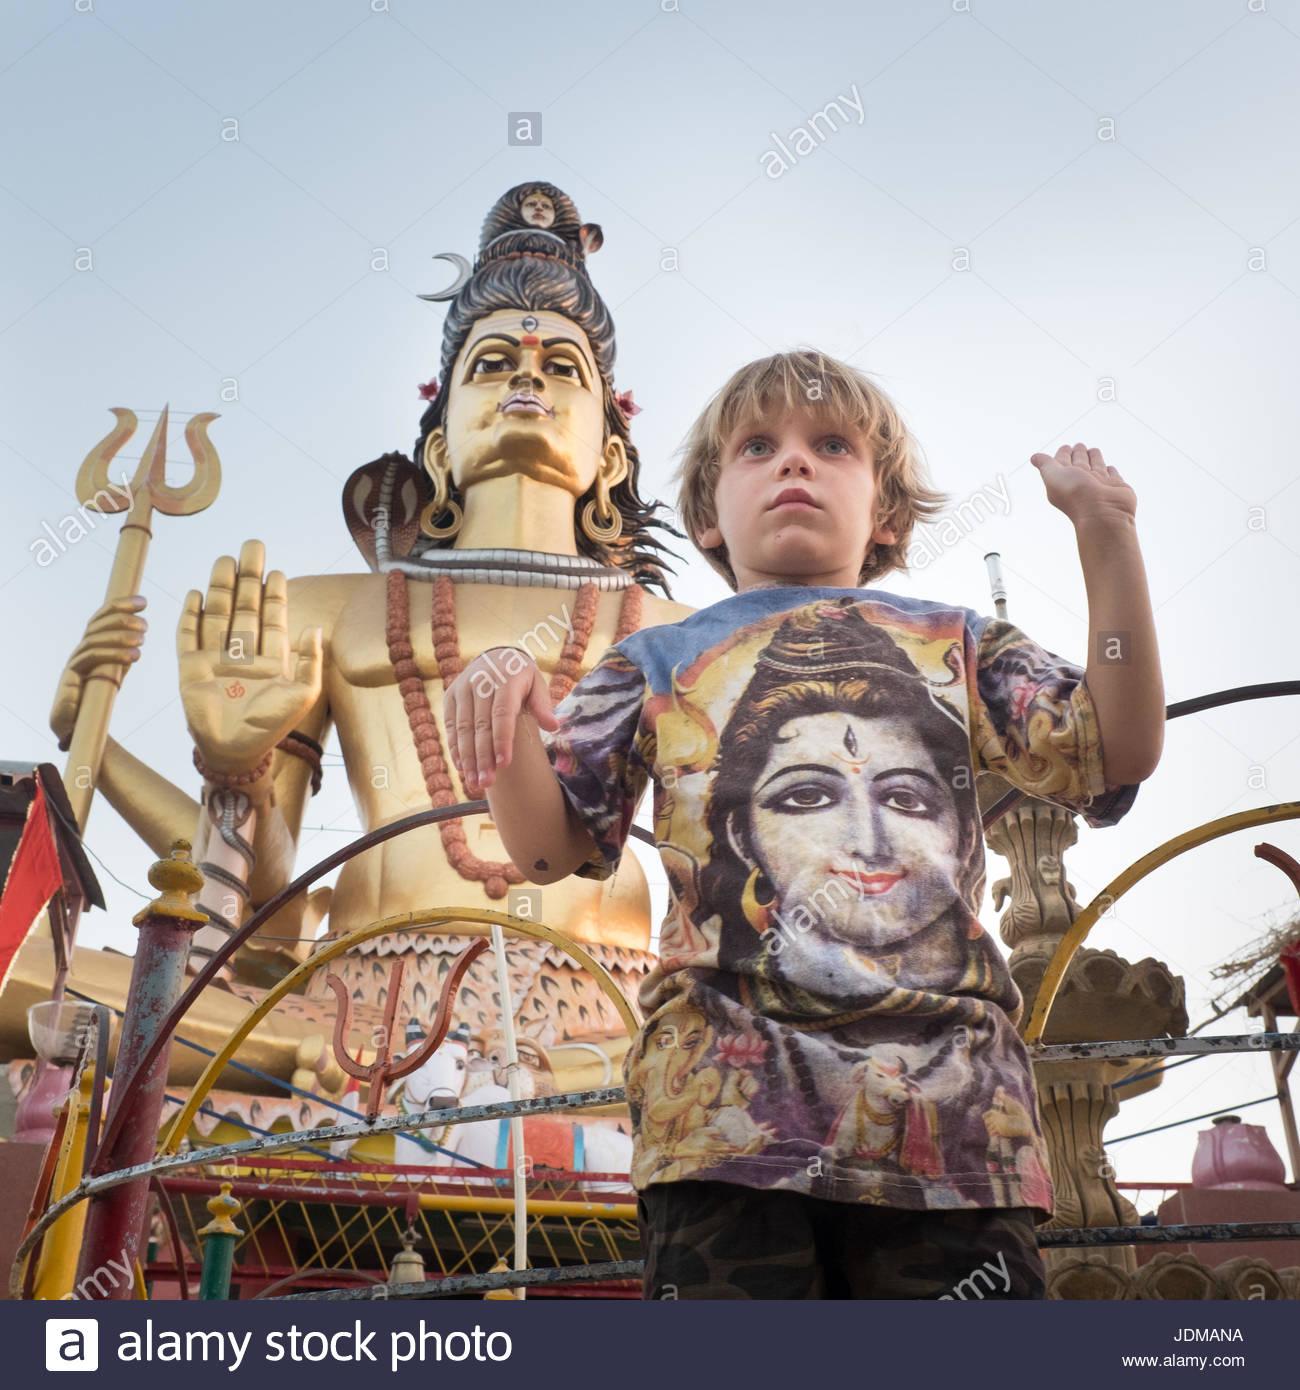 A European boy tries to imitate the pose of Shiva. - Stock Image